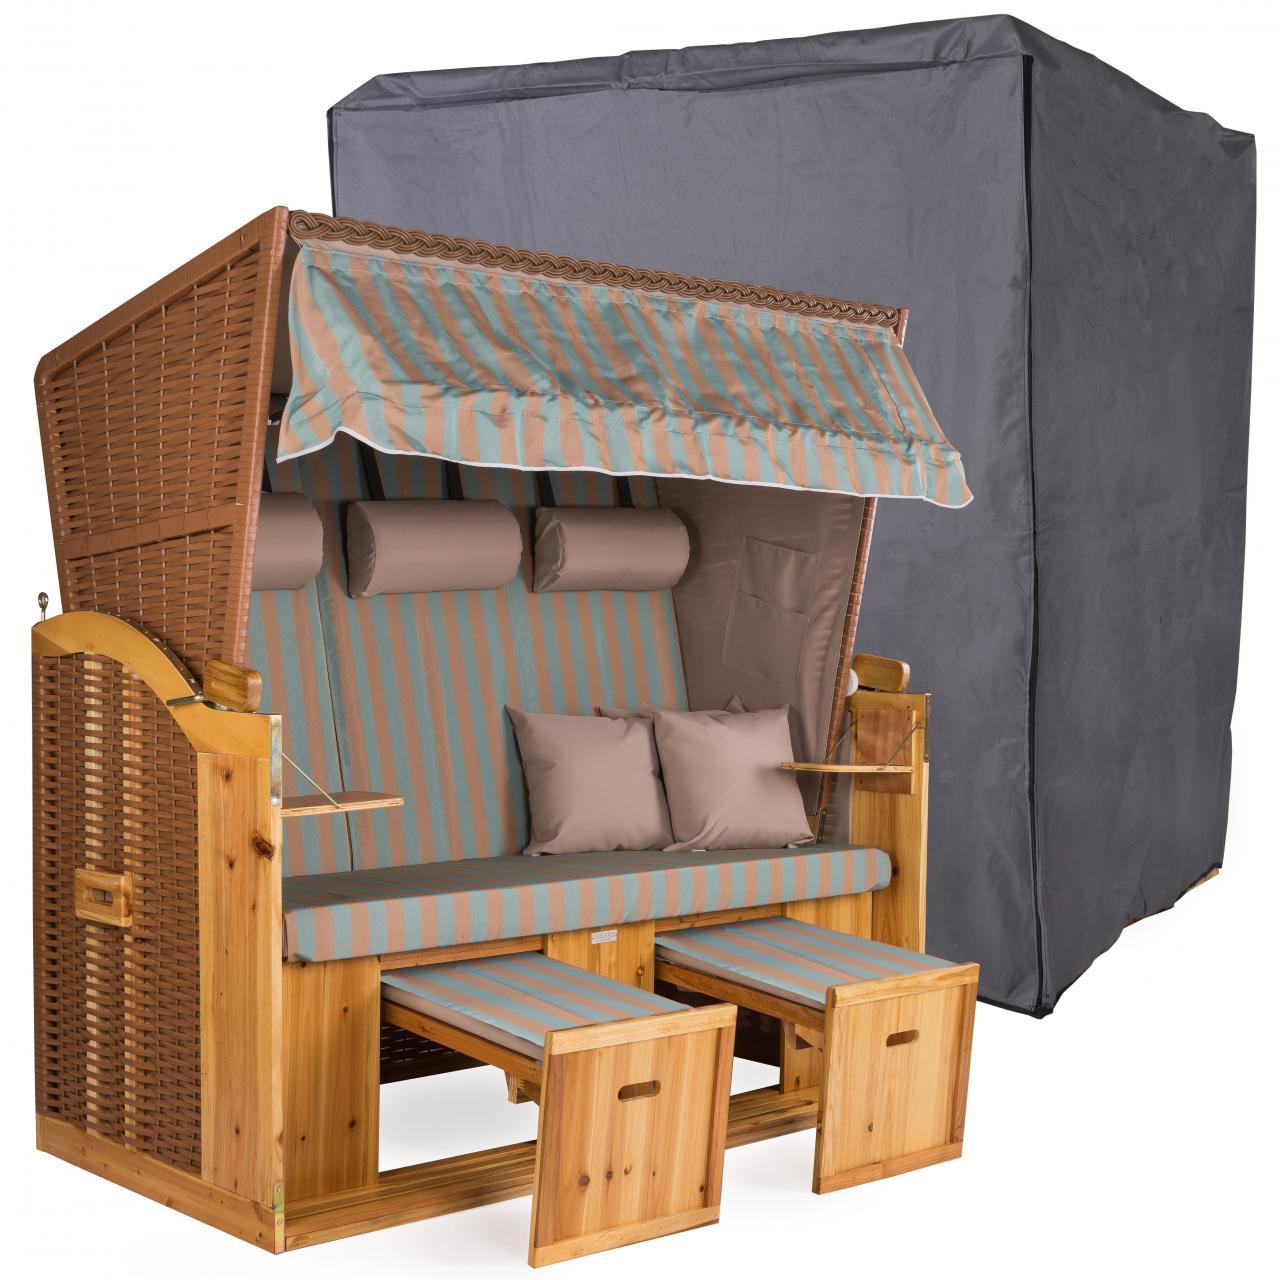 strandkorb xxl deluxe 160cm mit schutzh lle 600d volllieger nordsee gartenm bel ebay. Black Bedroom Furniture Sets. Home Design Ideas